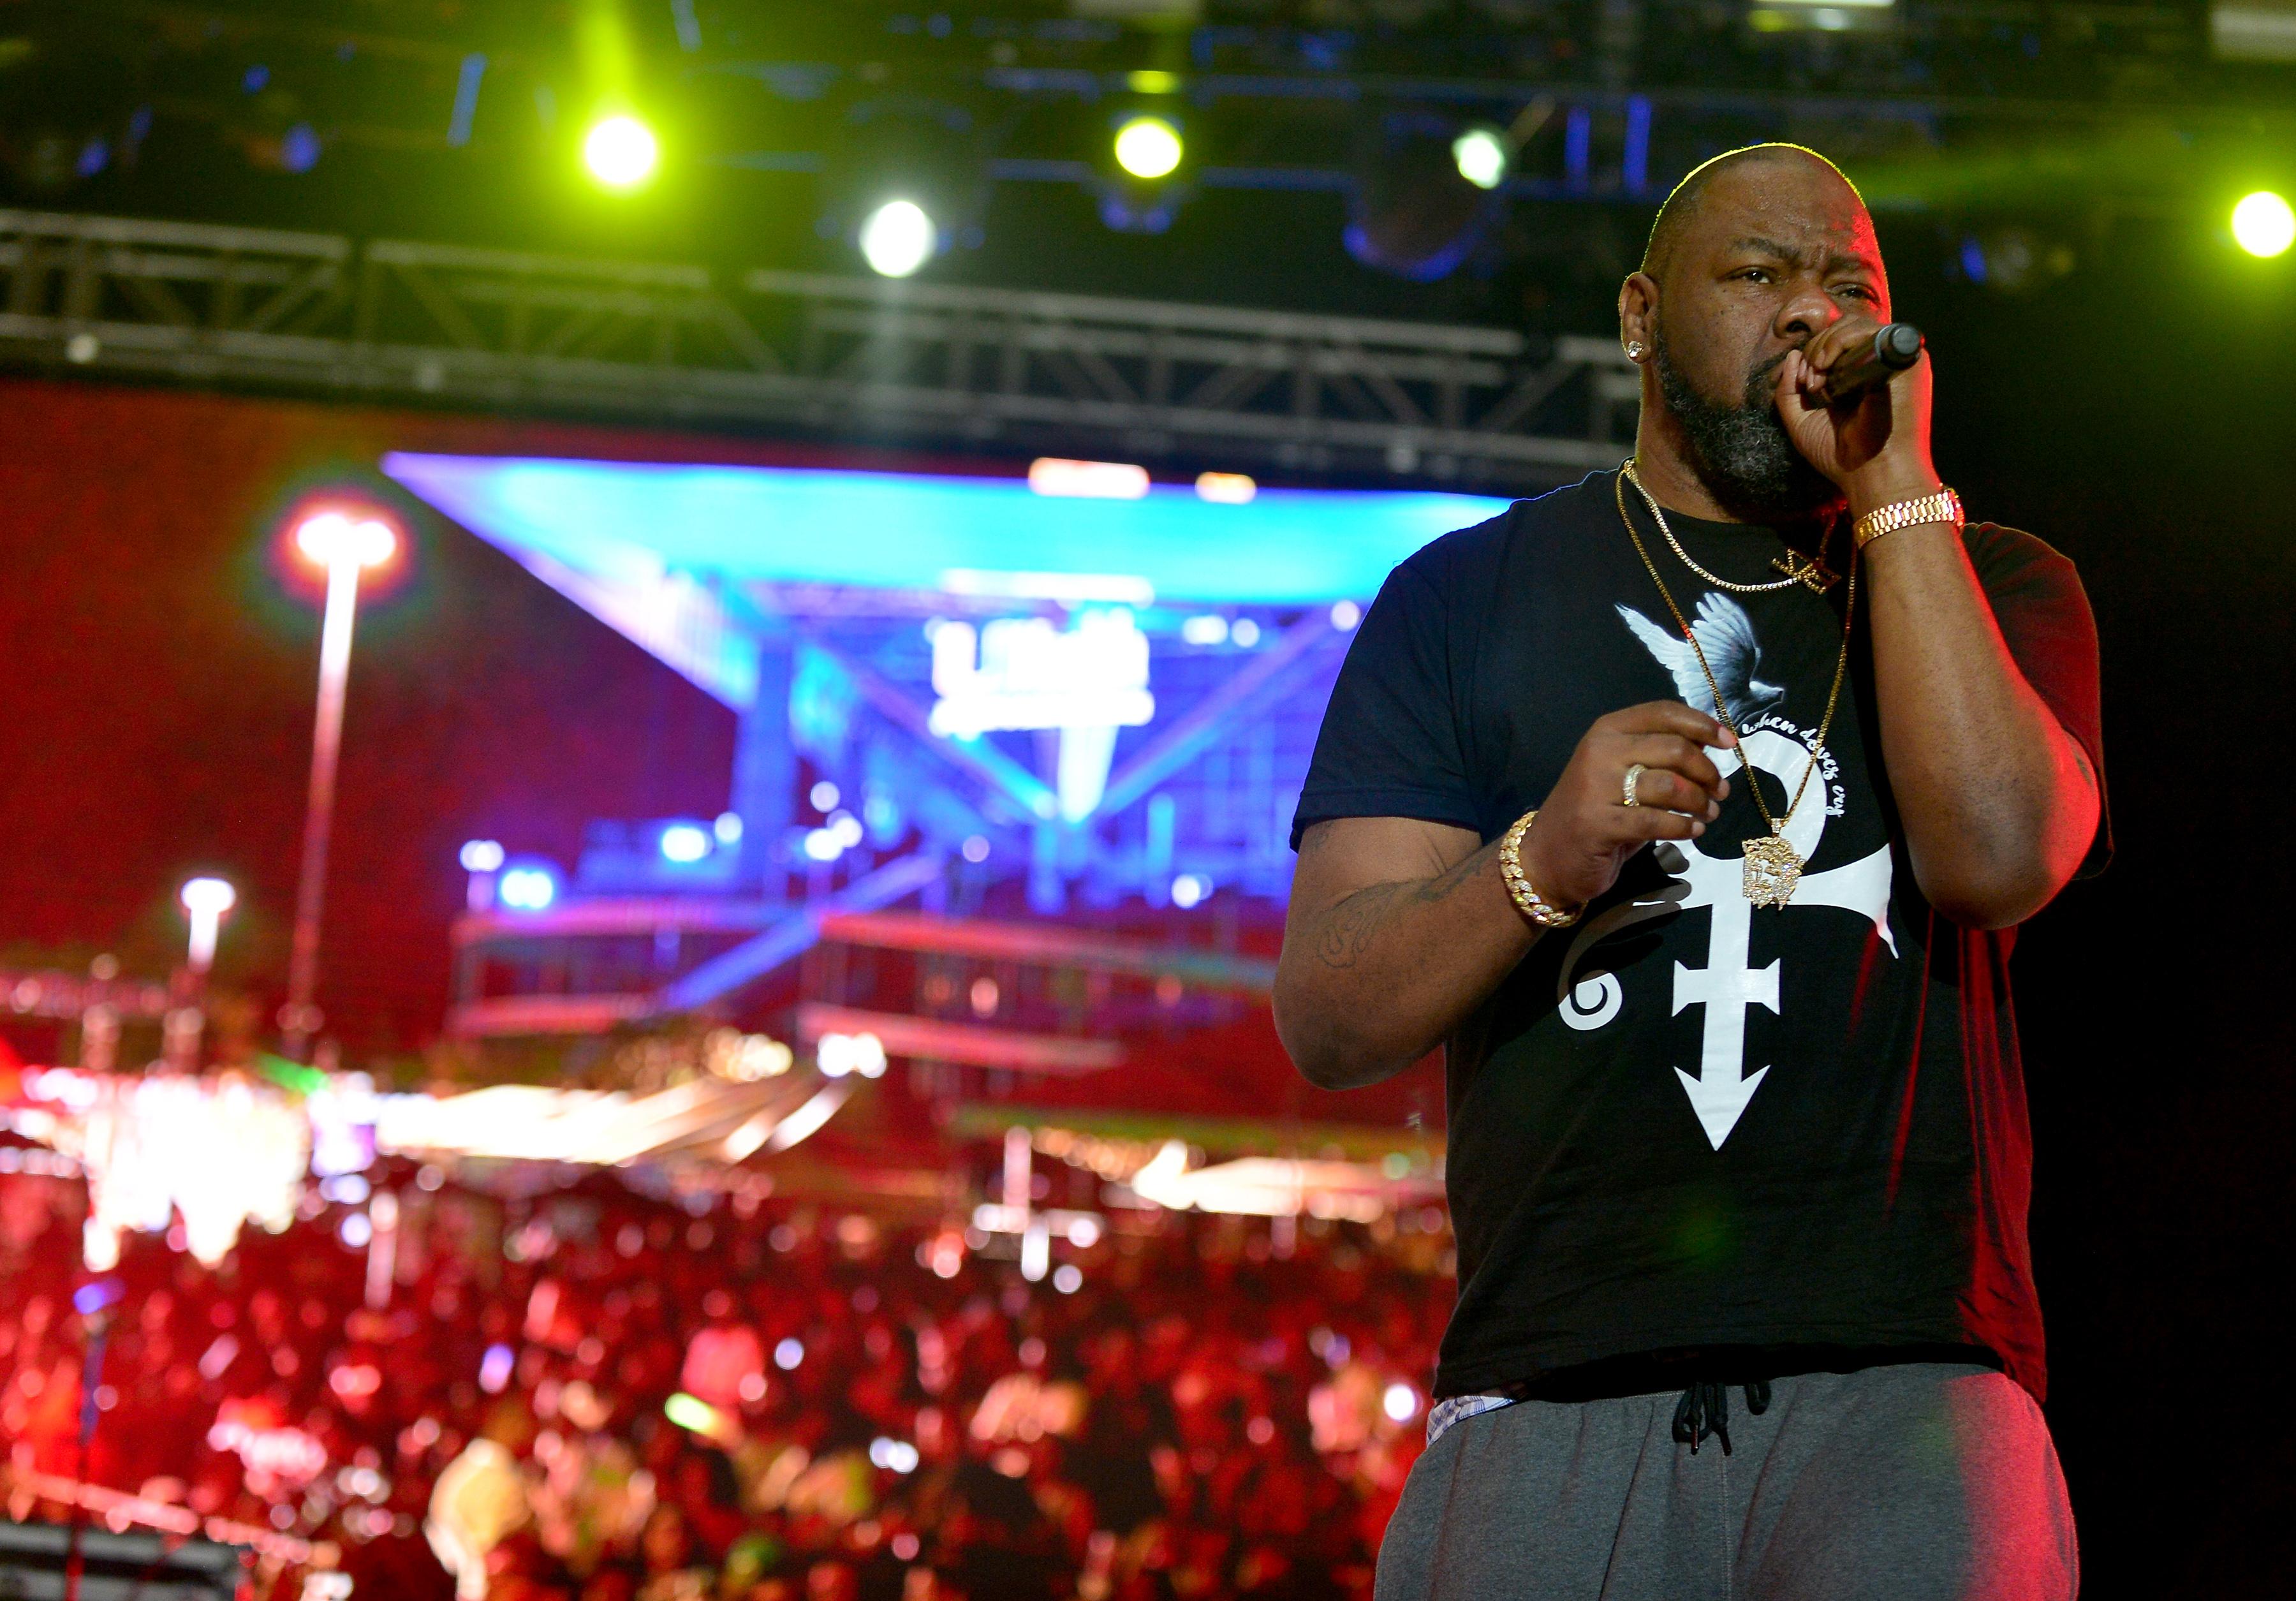 Biz Markie Honored By Hip-Hop Royalty At Long Island Memorial Service